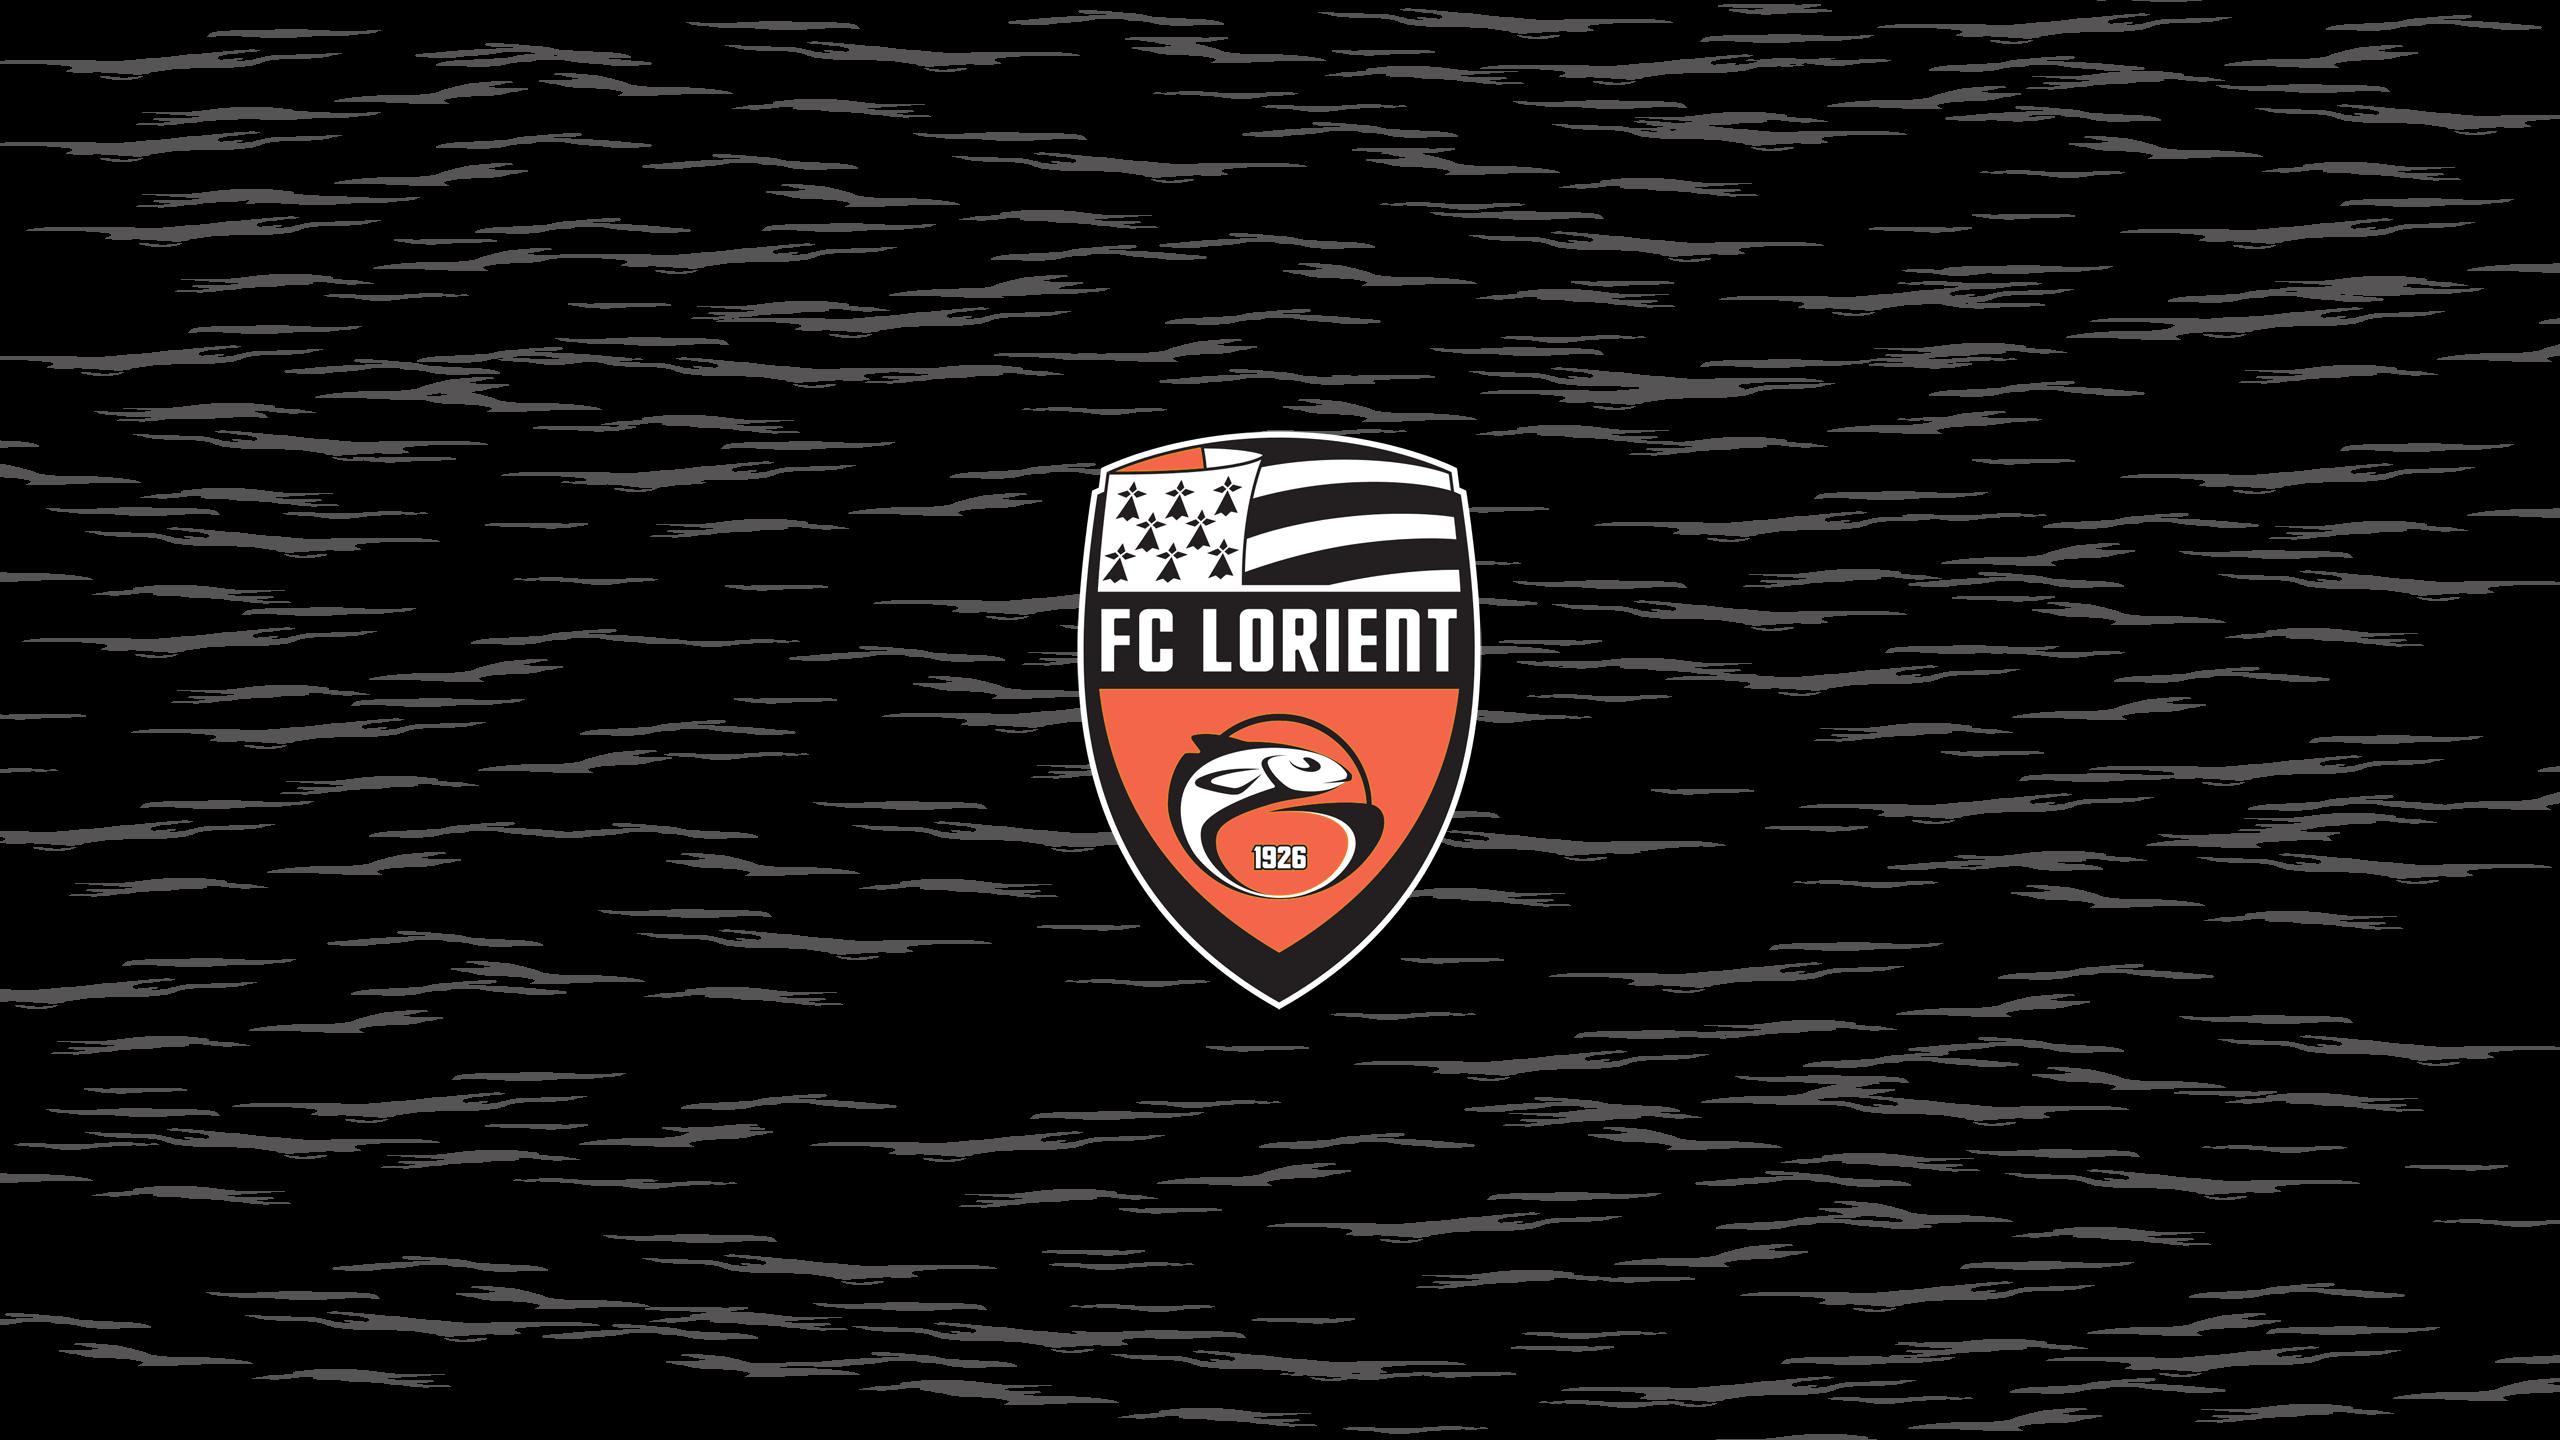 FC Lorient (Away)